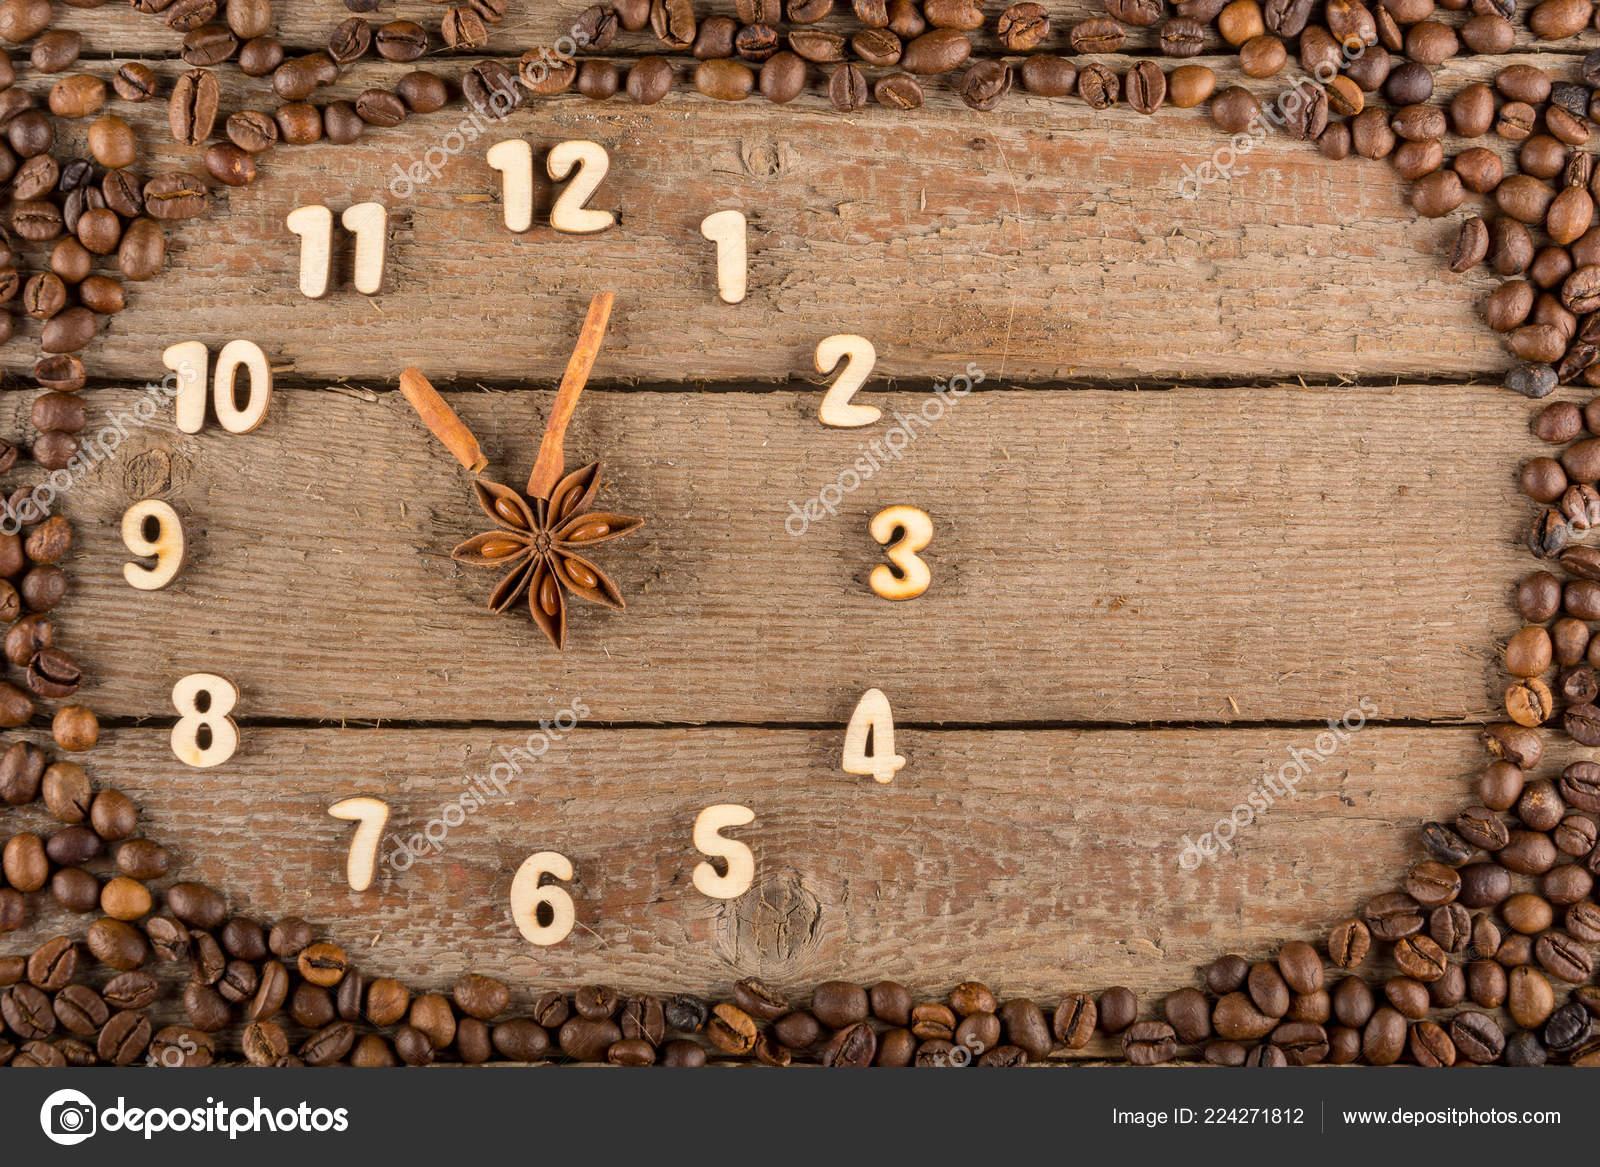 wooden kitchen clock portable pantry 装饰时钟与木数字和箭头的肉桂棒11点在木制背景和咖啡豆框架复制空间 装饰时钟与木数字和箭头的肉桂棒 显示11点 在木制背景和咖啡豆框架 厨房 广告 横幅 复制空间 平 照片作者fordvika